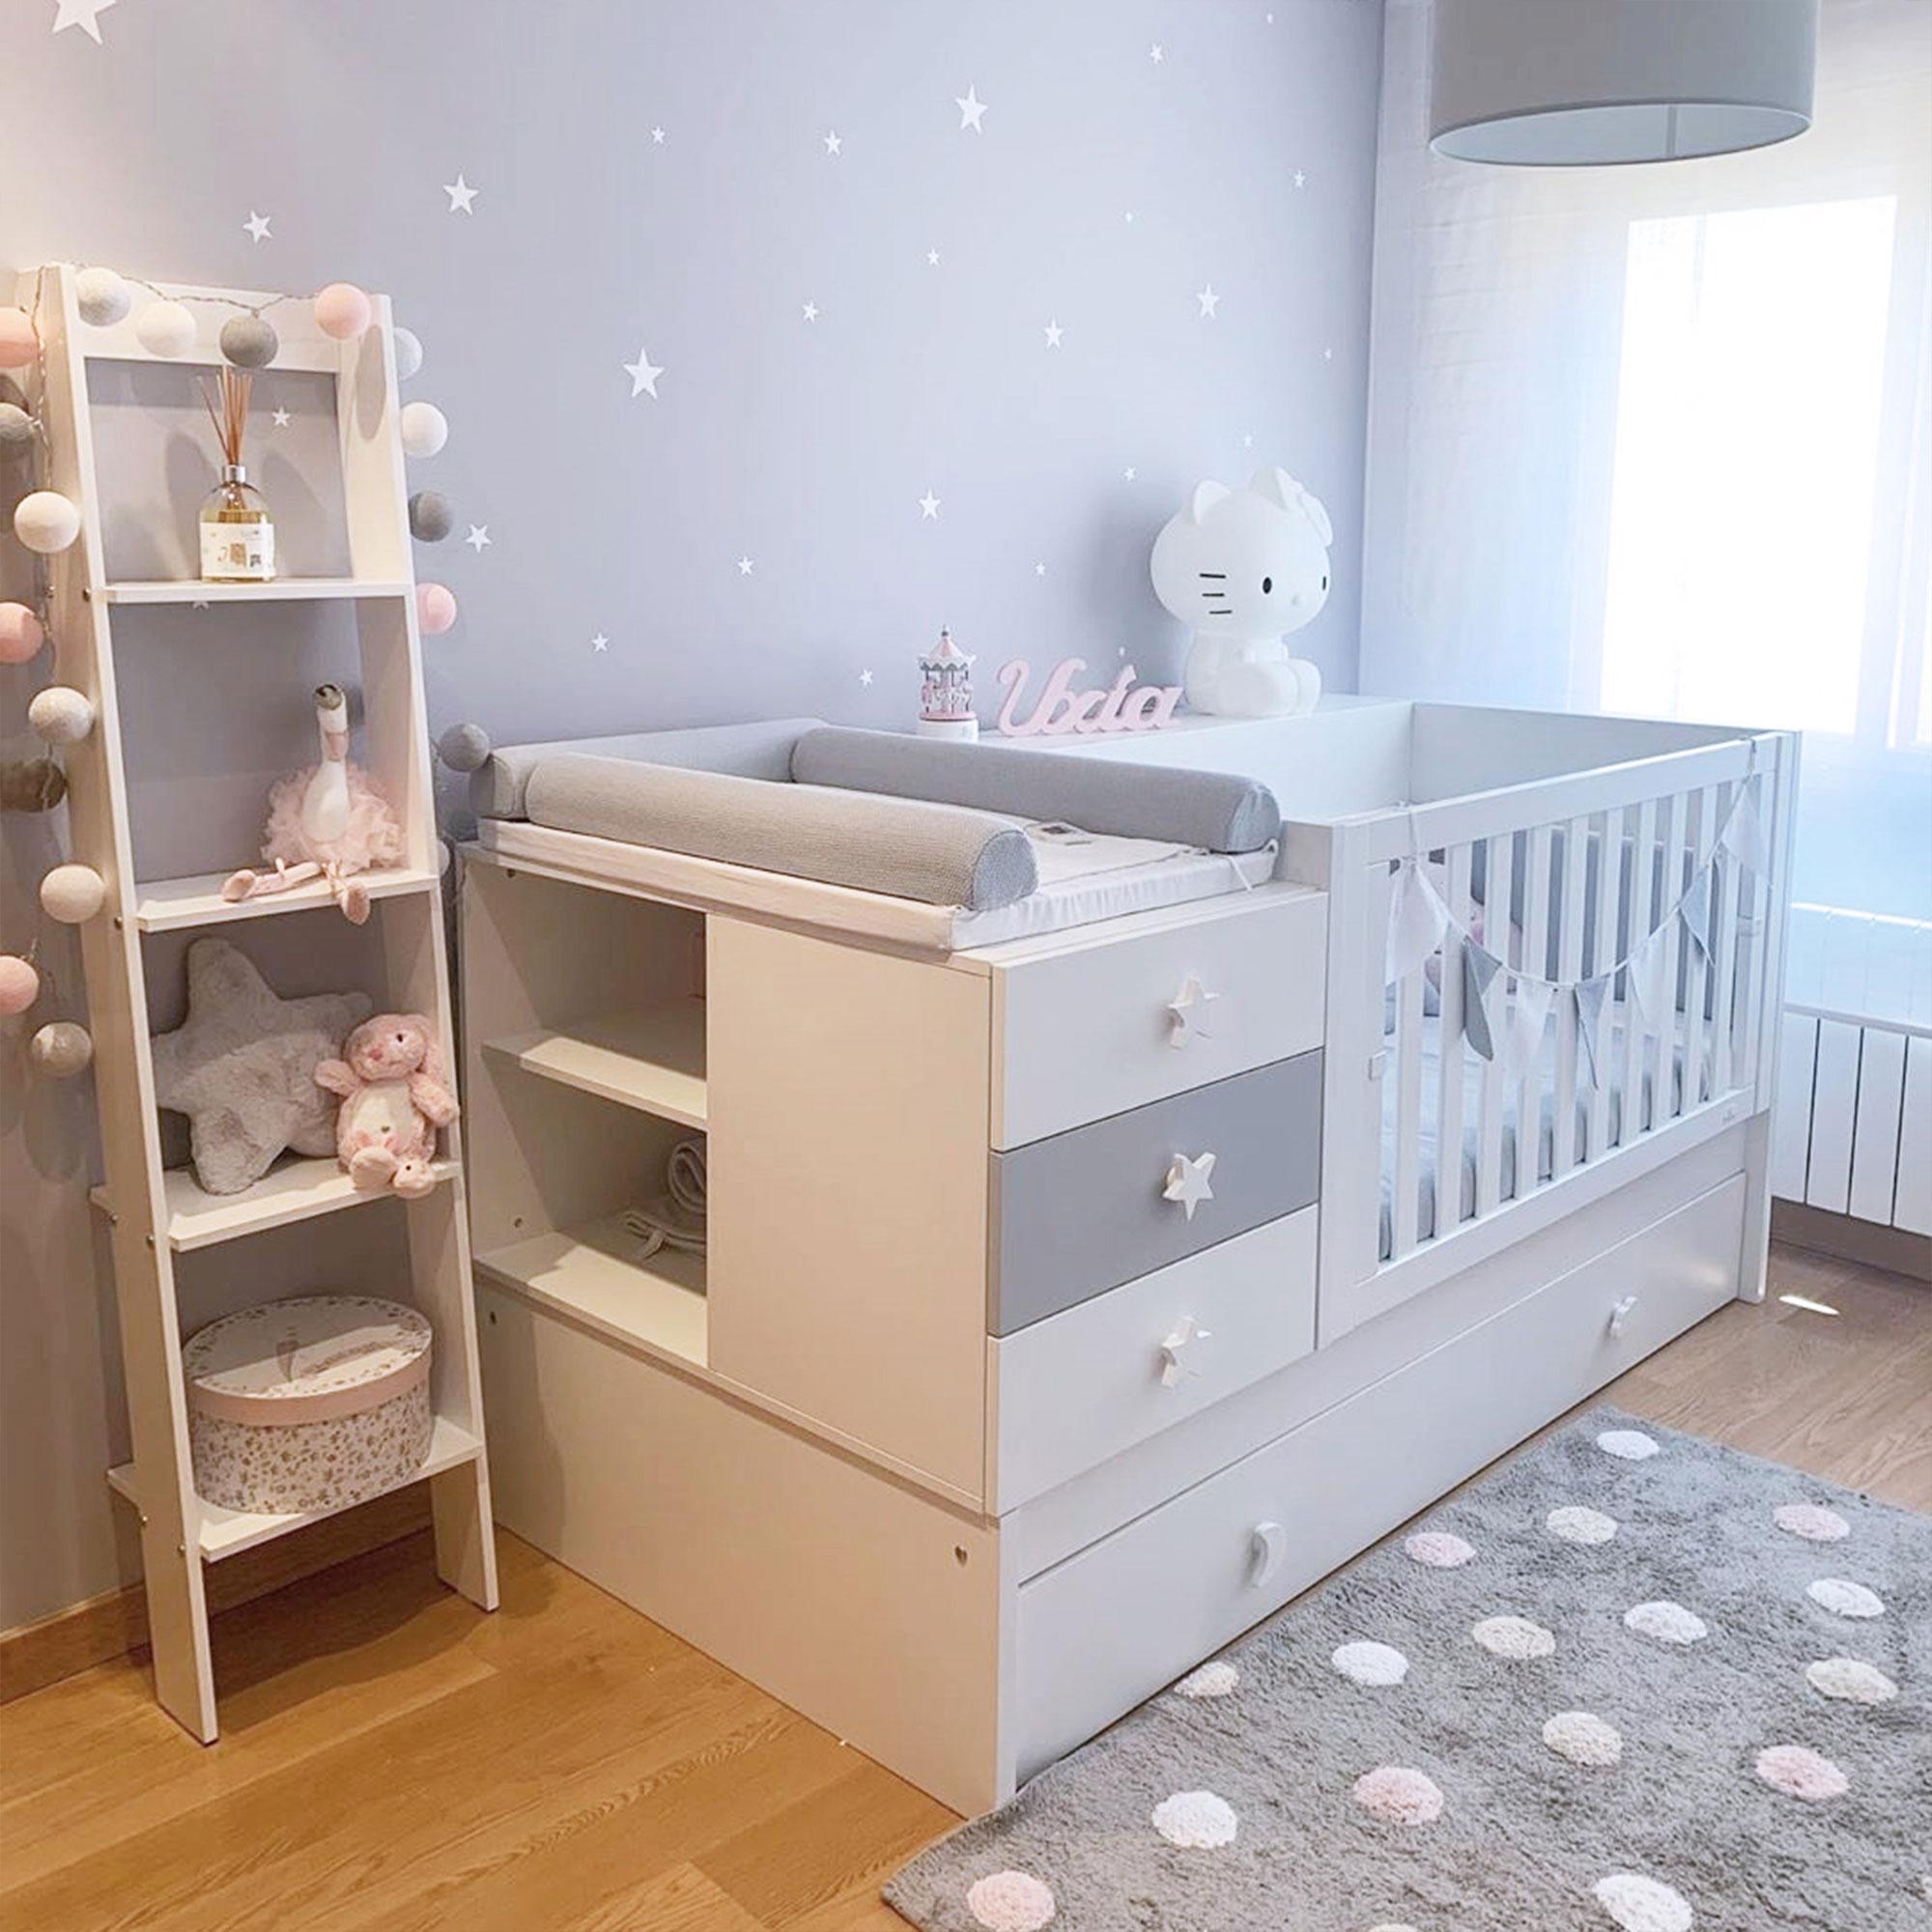 Dormitorio de bebé con cuna convertible